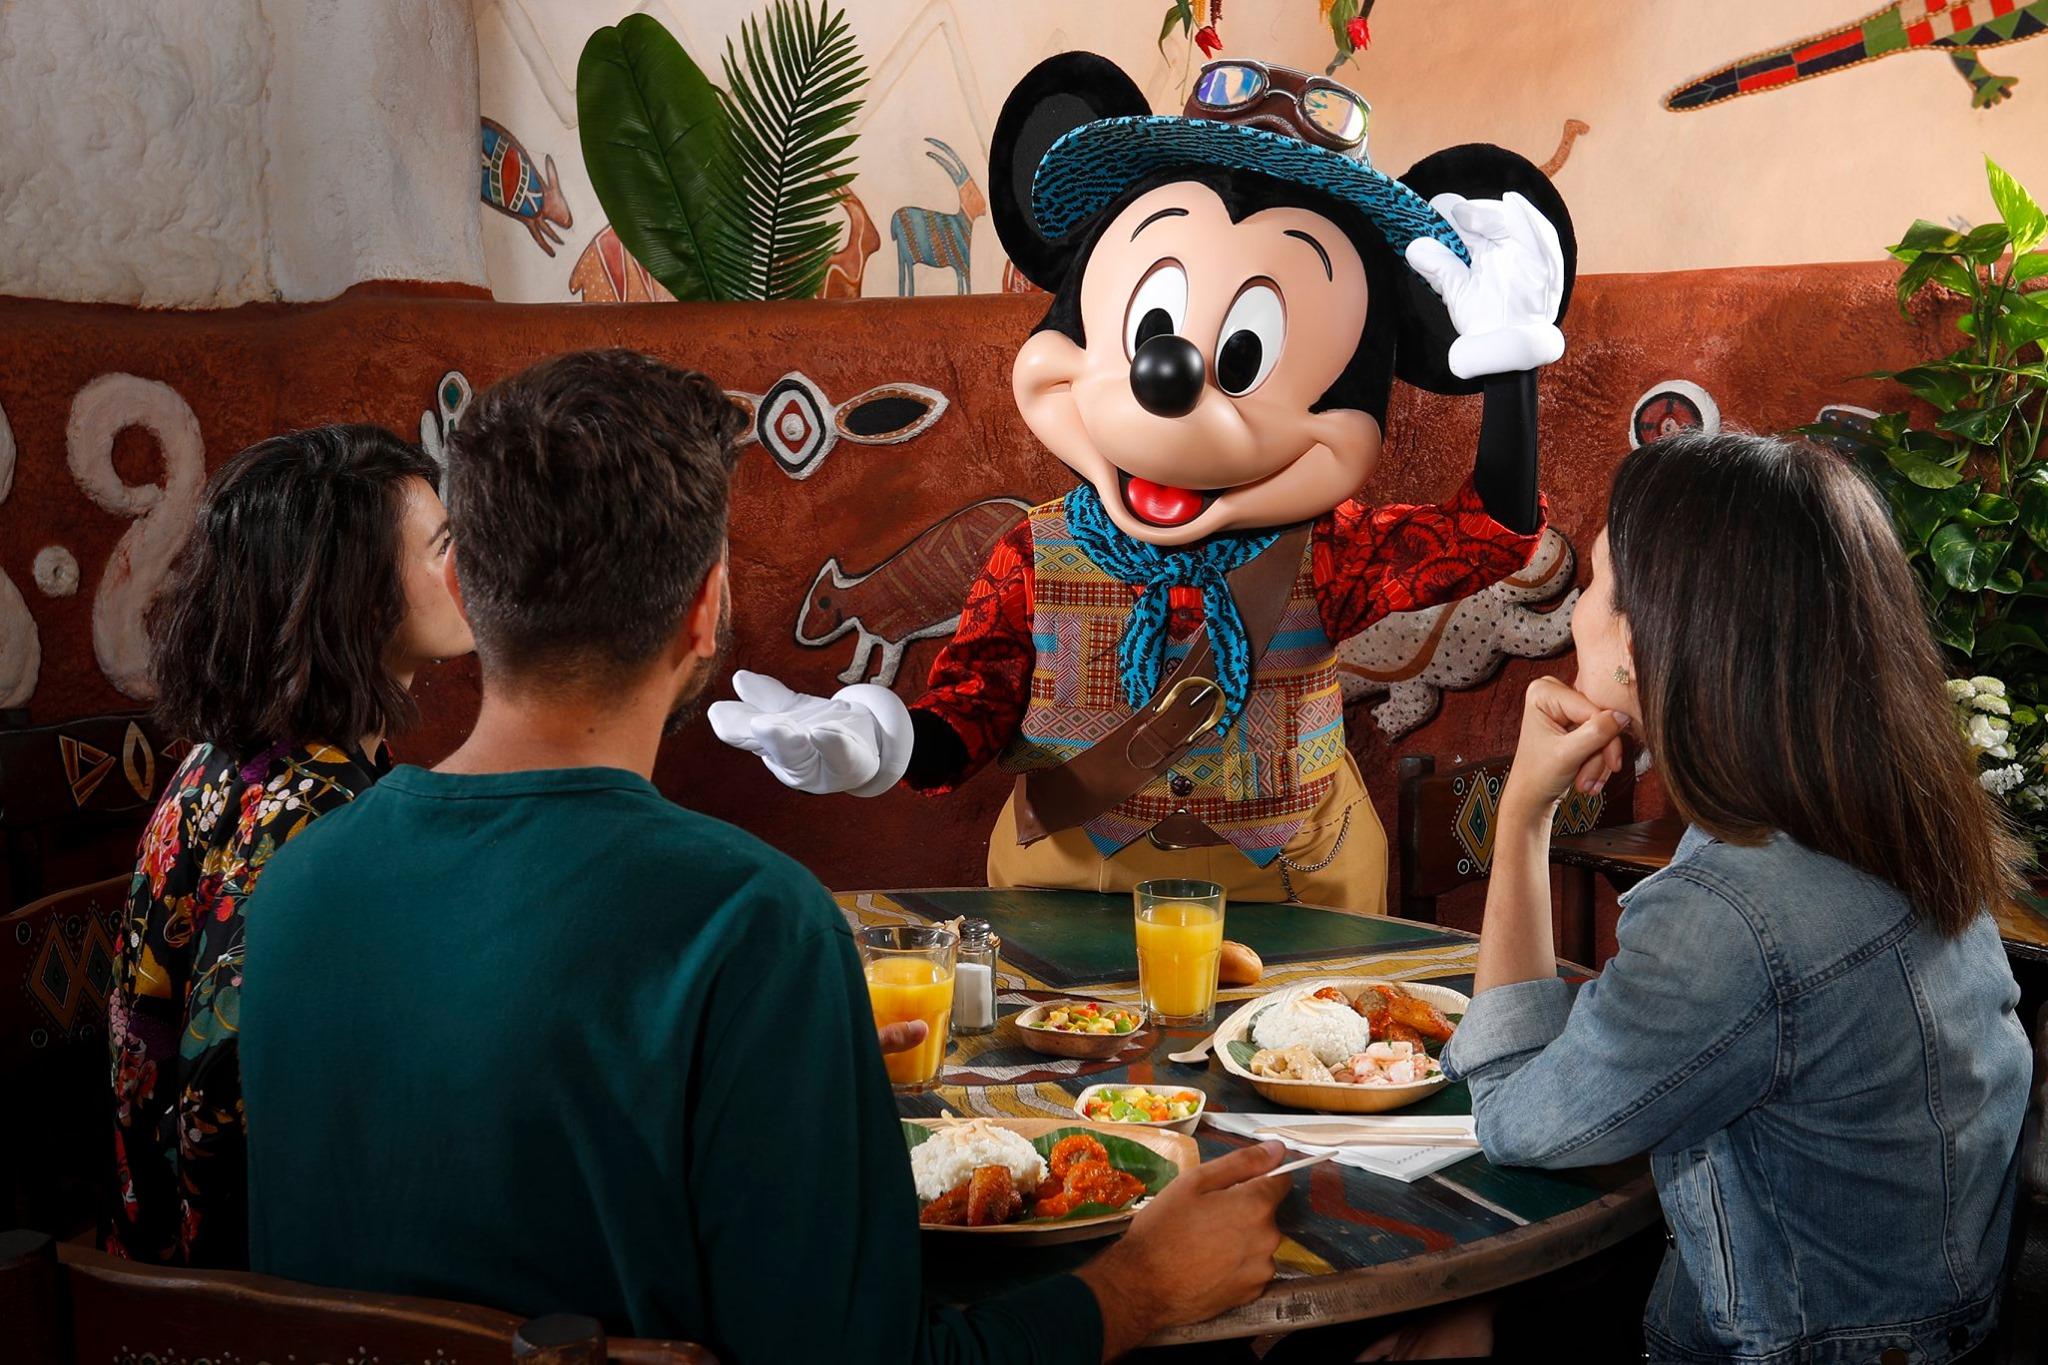 Repas africain avec Mickey - Festival du Roi Lion - Disneyland Paris